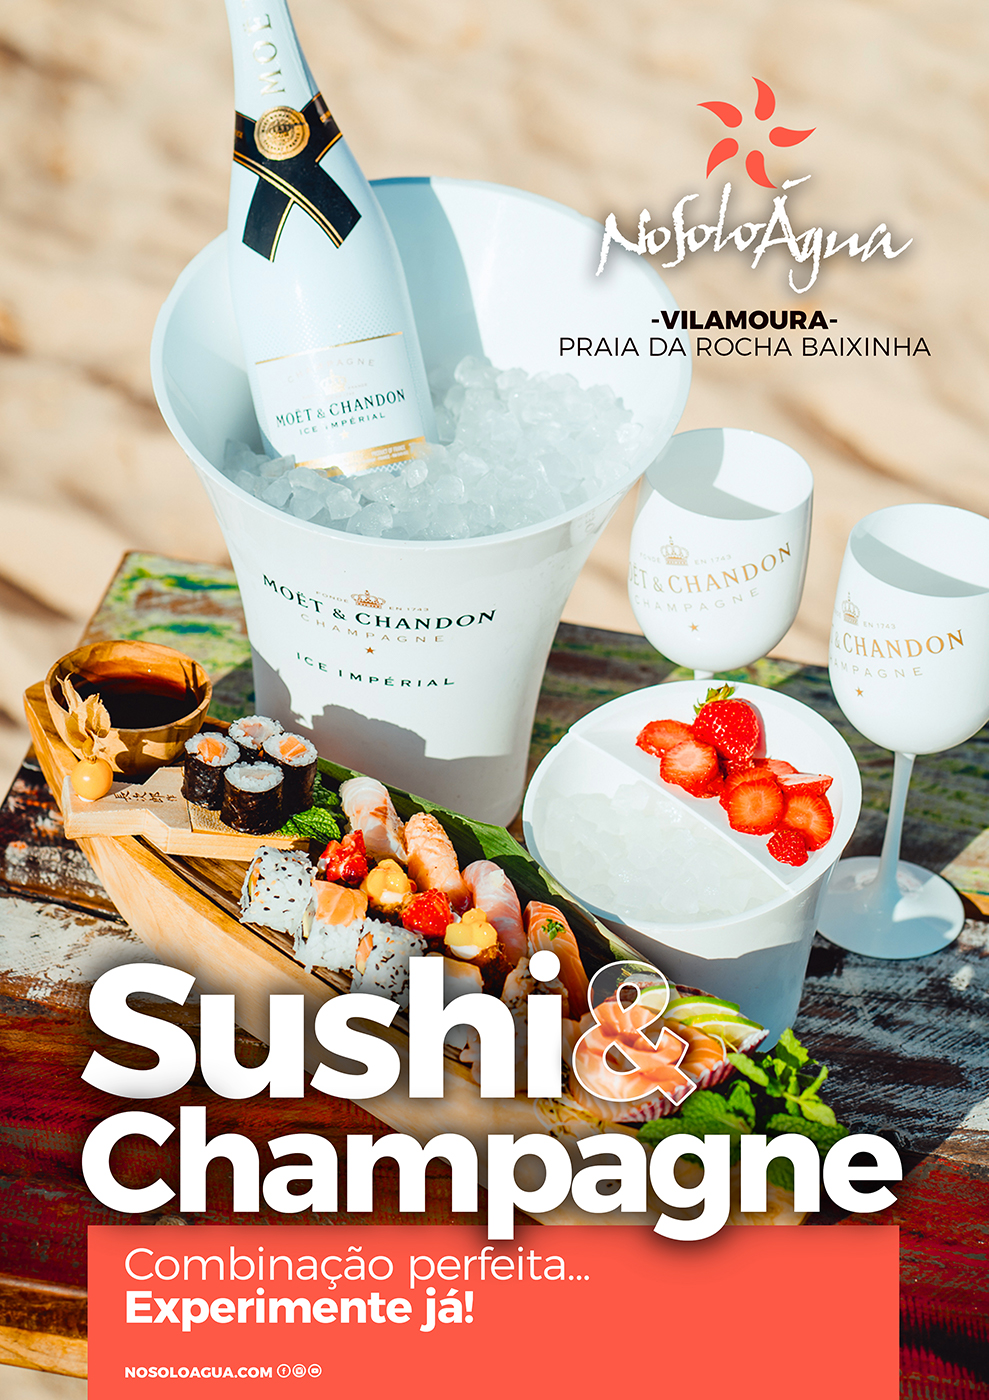 Sushi & Champagne